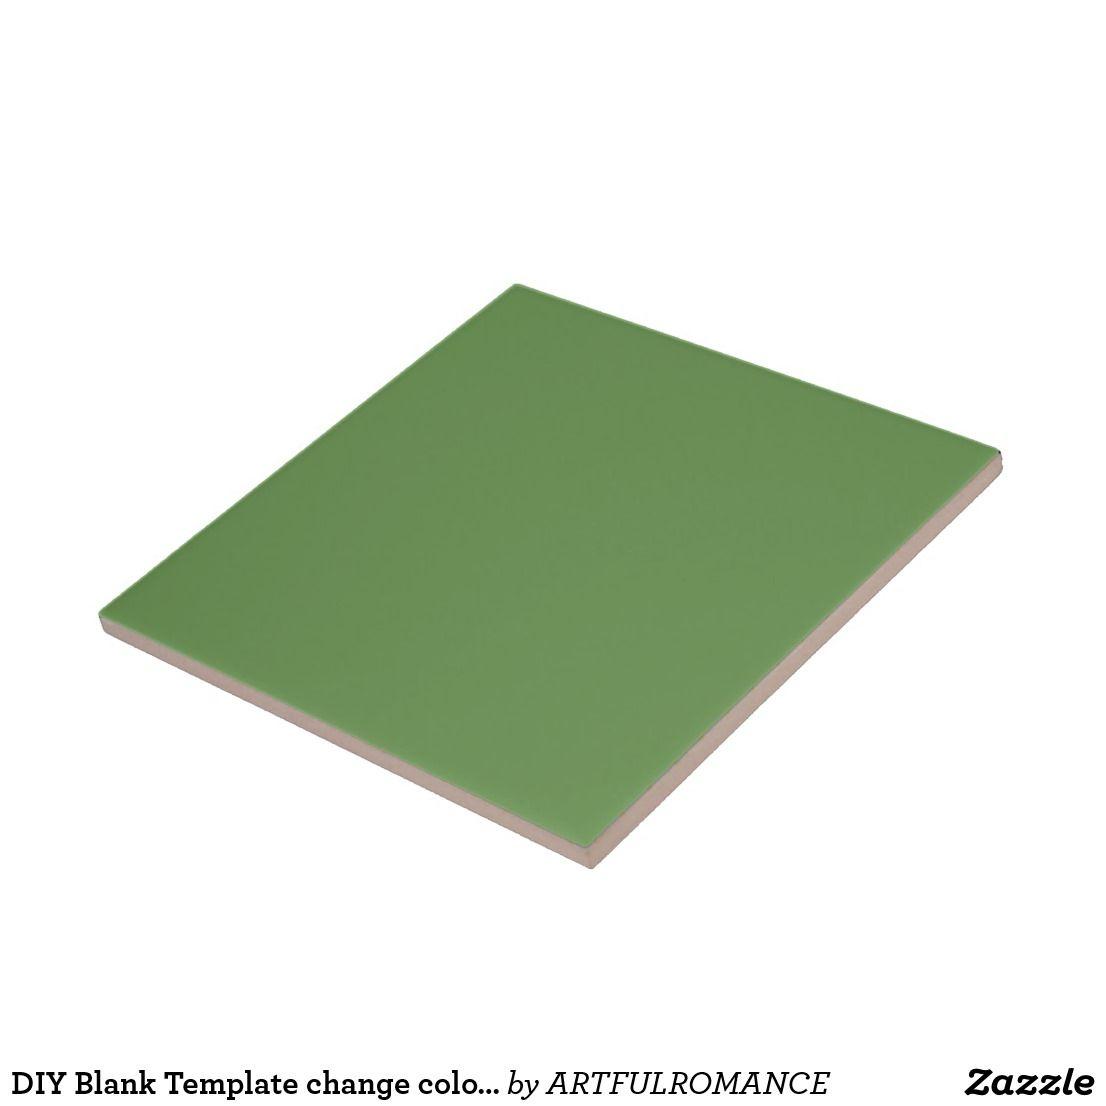 DIY Blank Template change color add text image Ceramic Tile | 101 ...